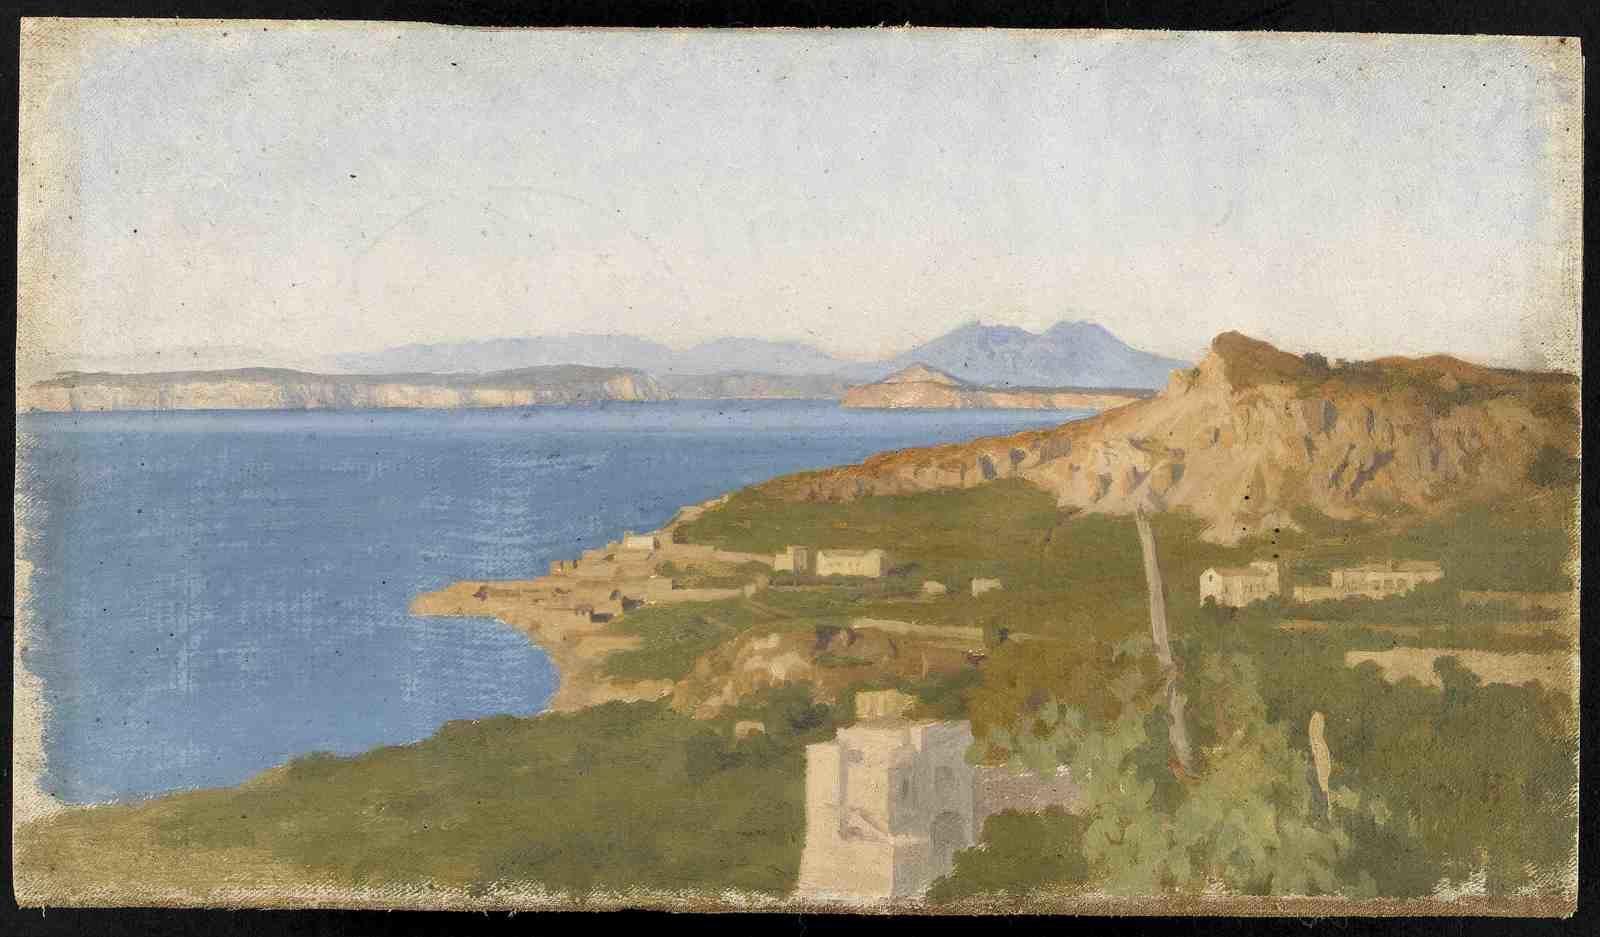 Ischia, côte escarpée/Paris, musée national Ernest Hébert/RMN